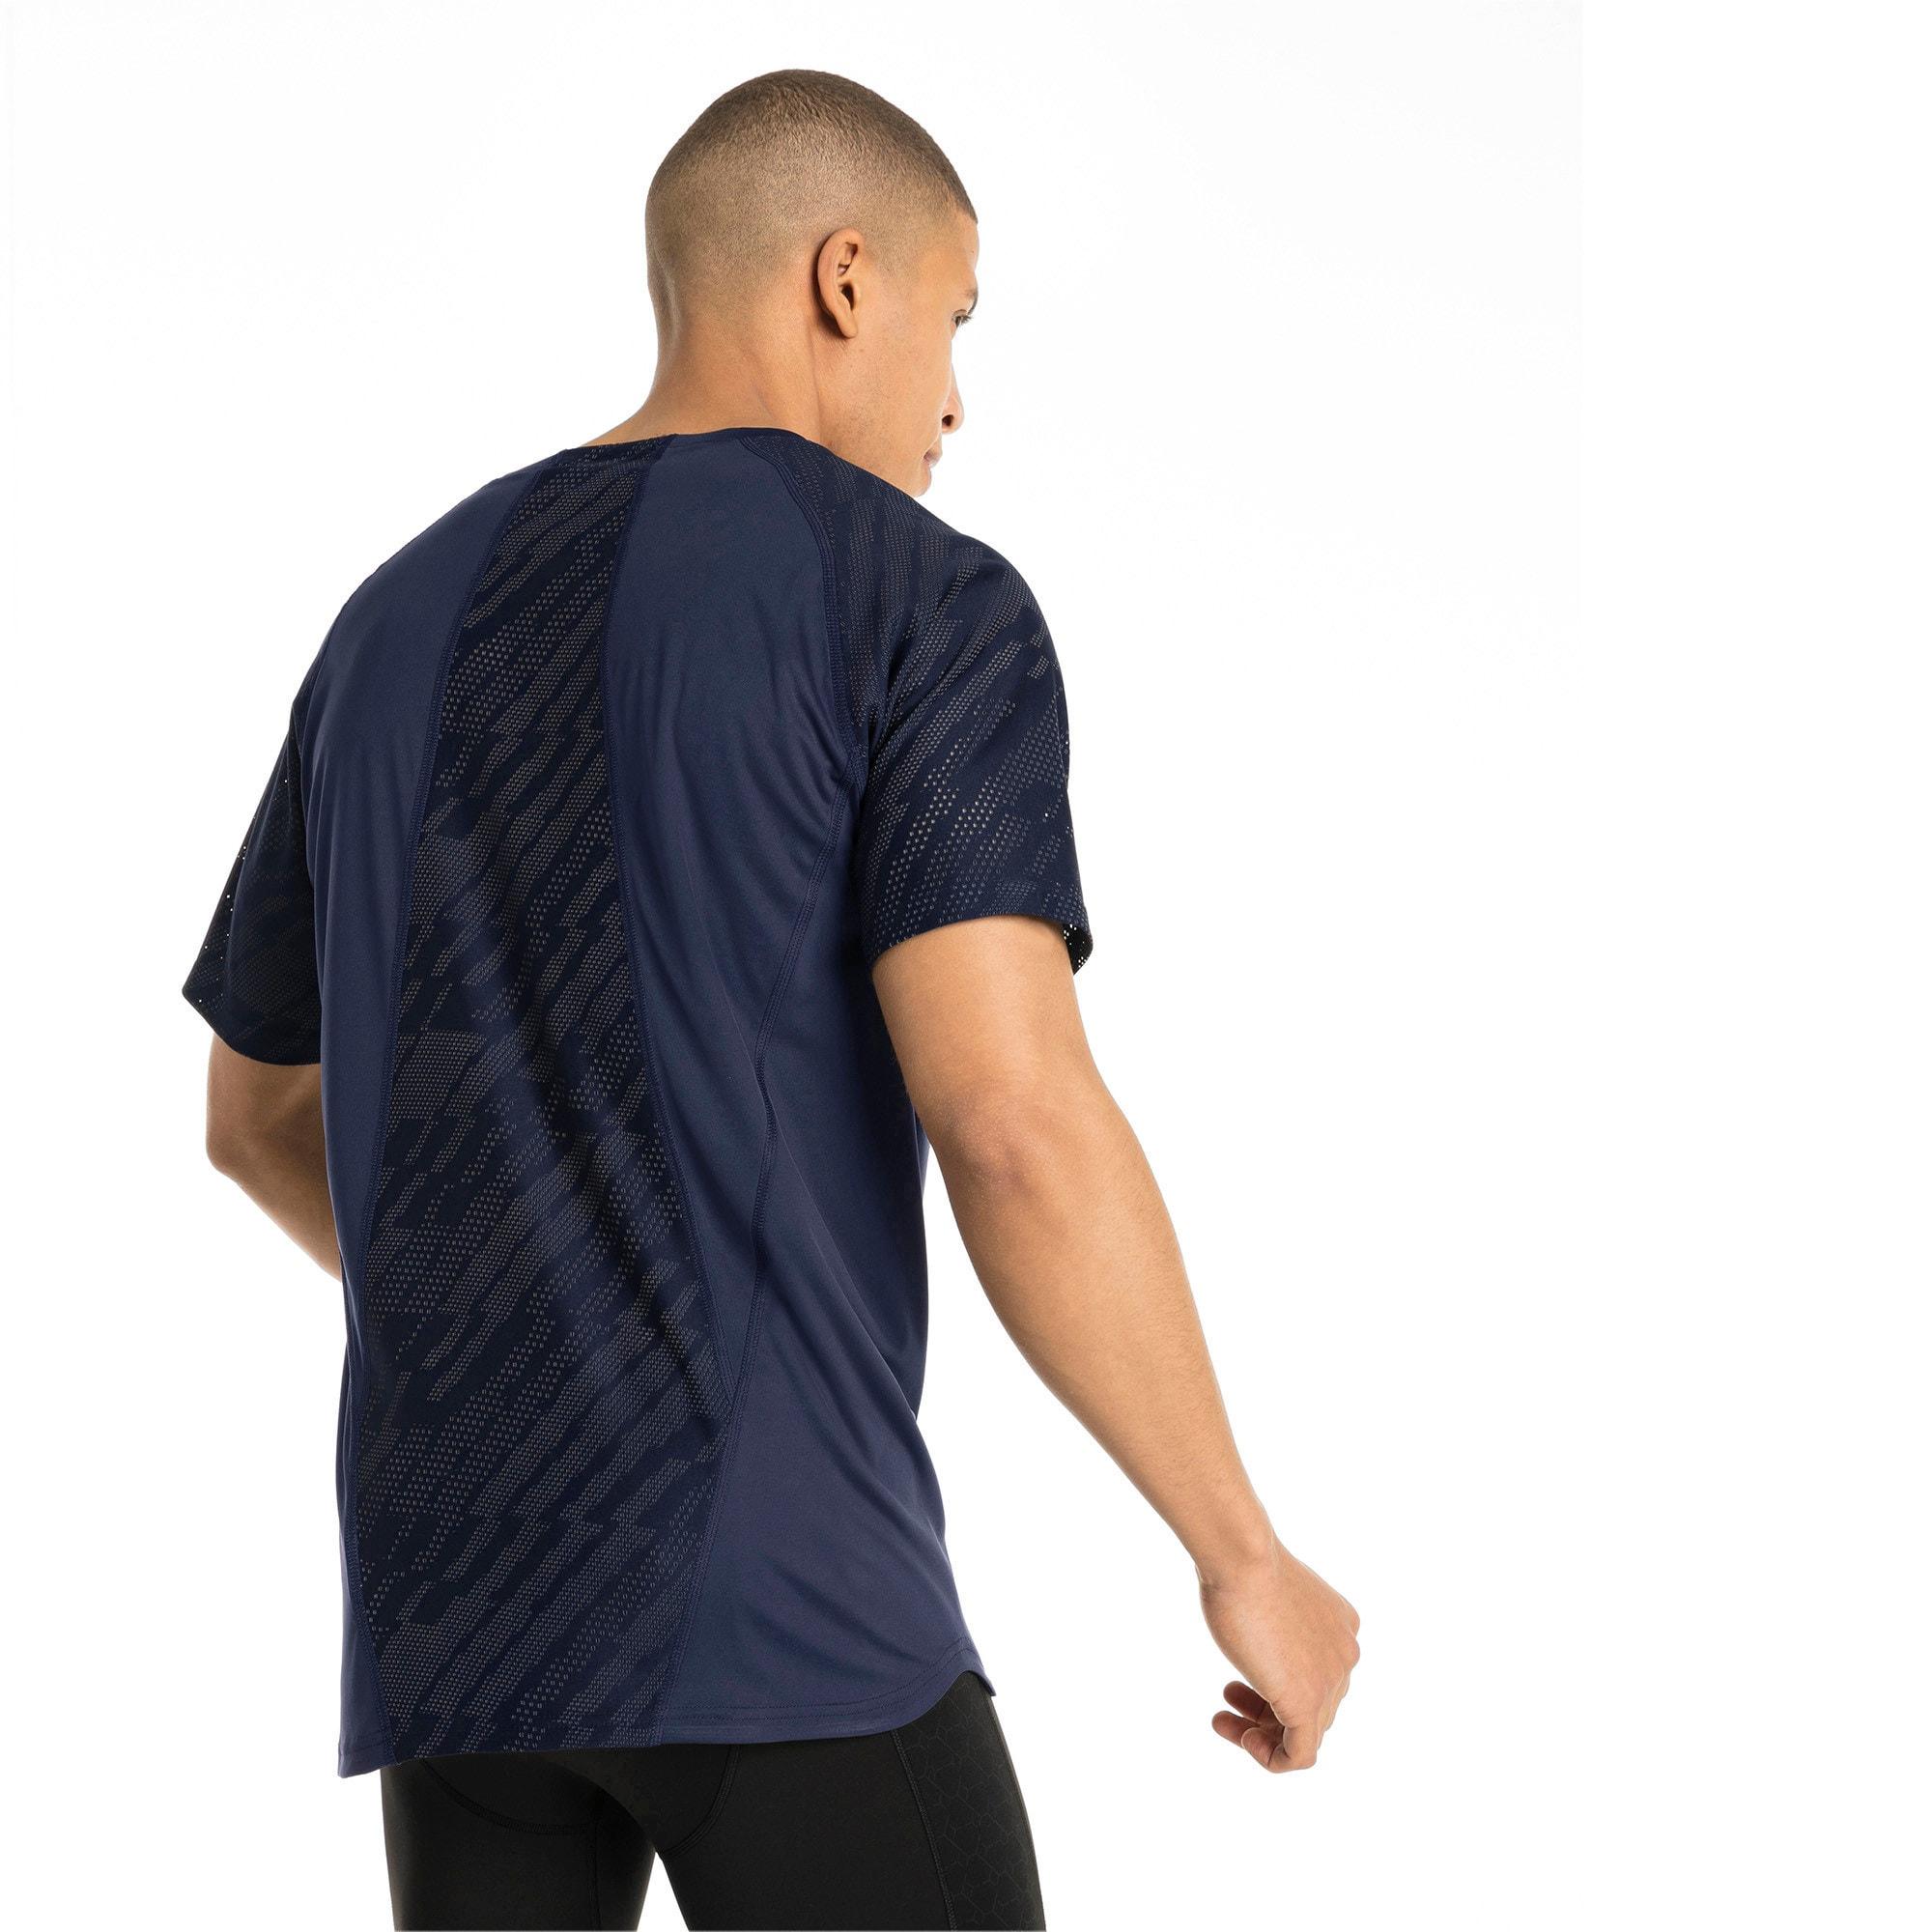 Thumbnail 3 of VENT Graphic Men's T-Shirt, Peacoat-iron gate, medium